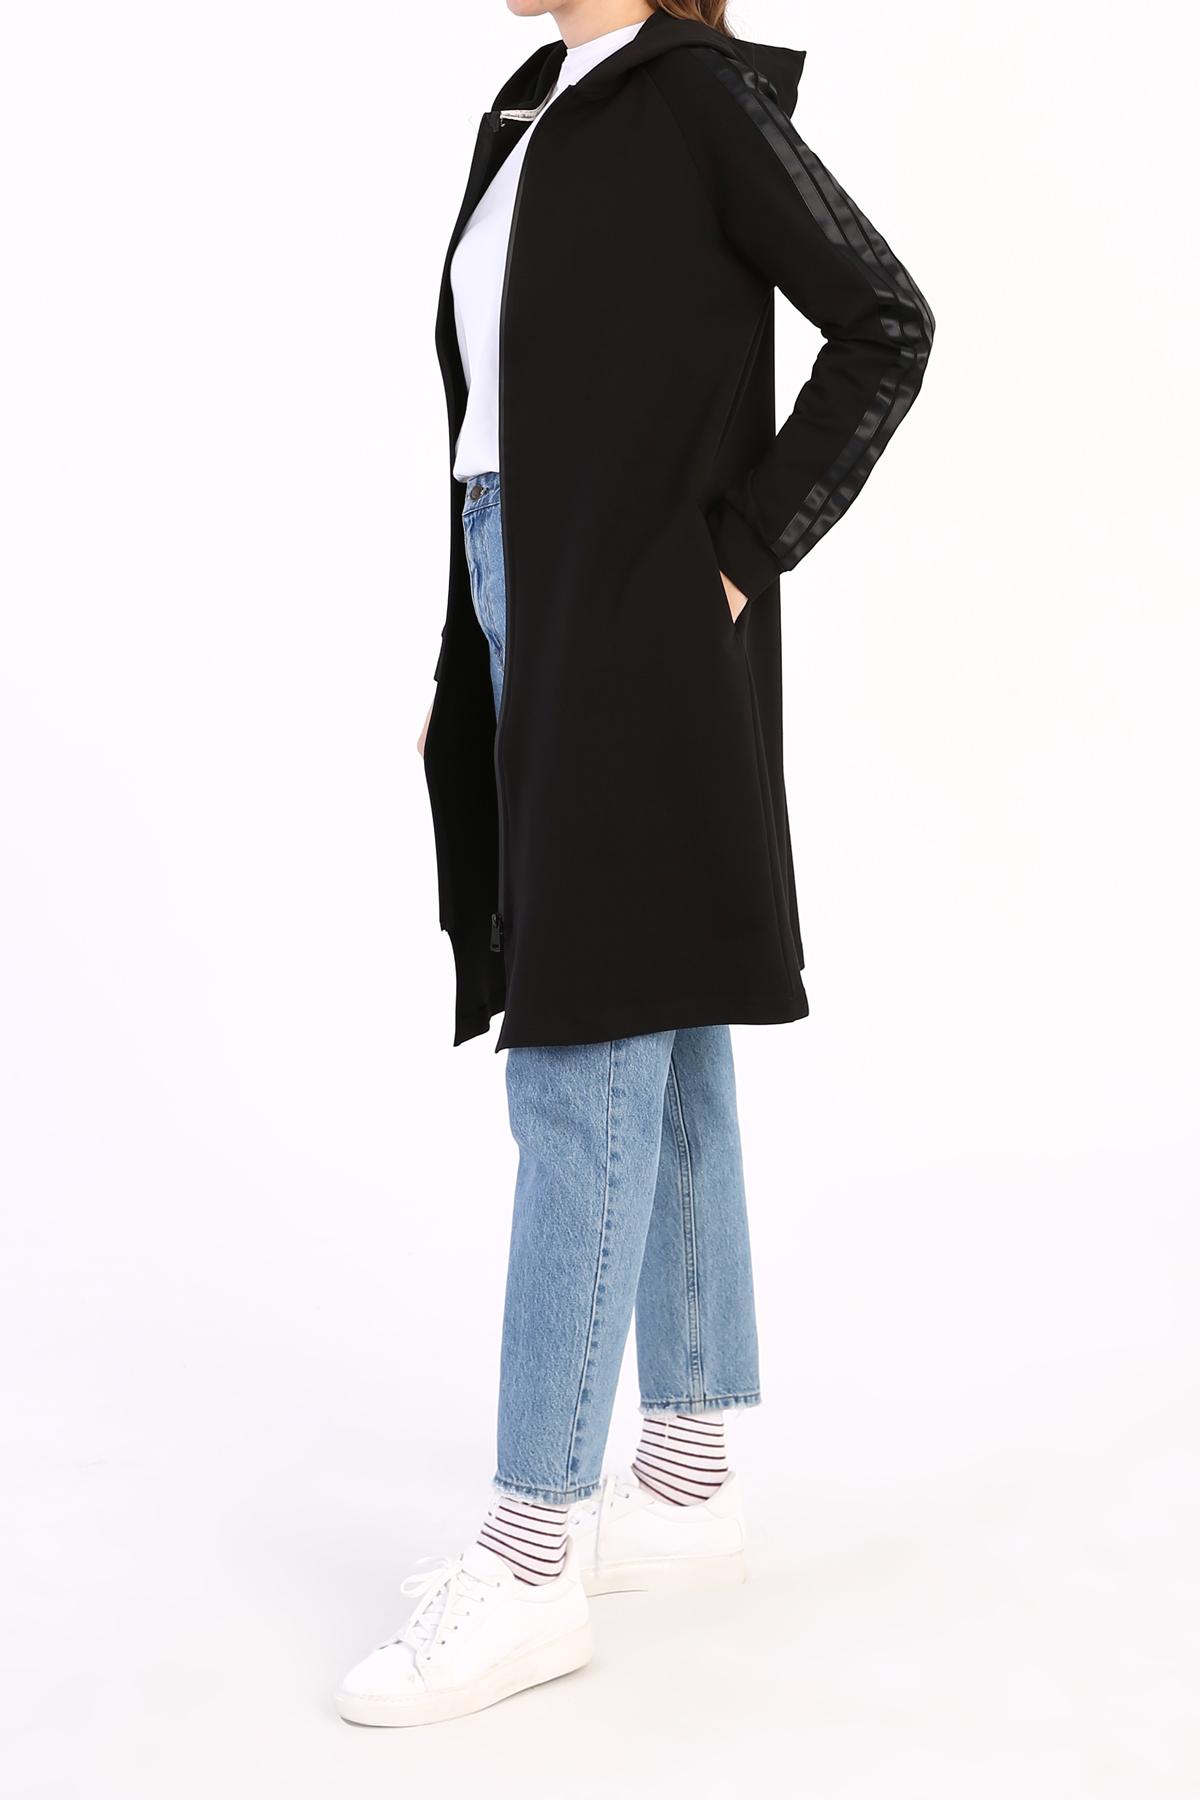 Satin Line Detailed Hooded Long Cardigan